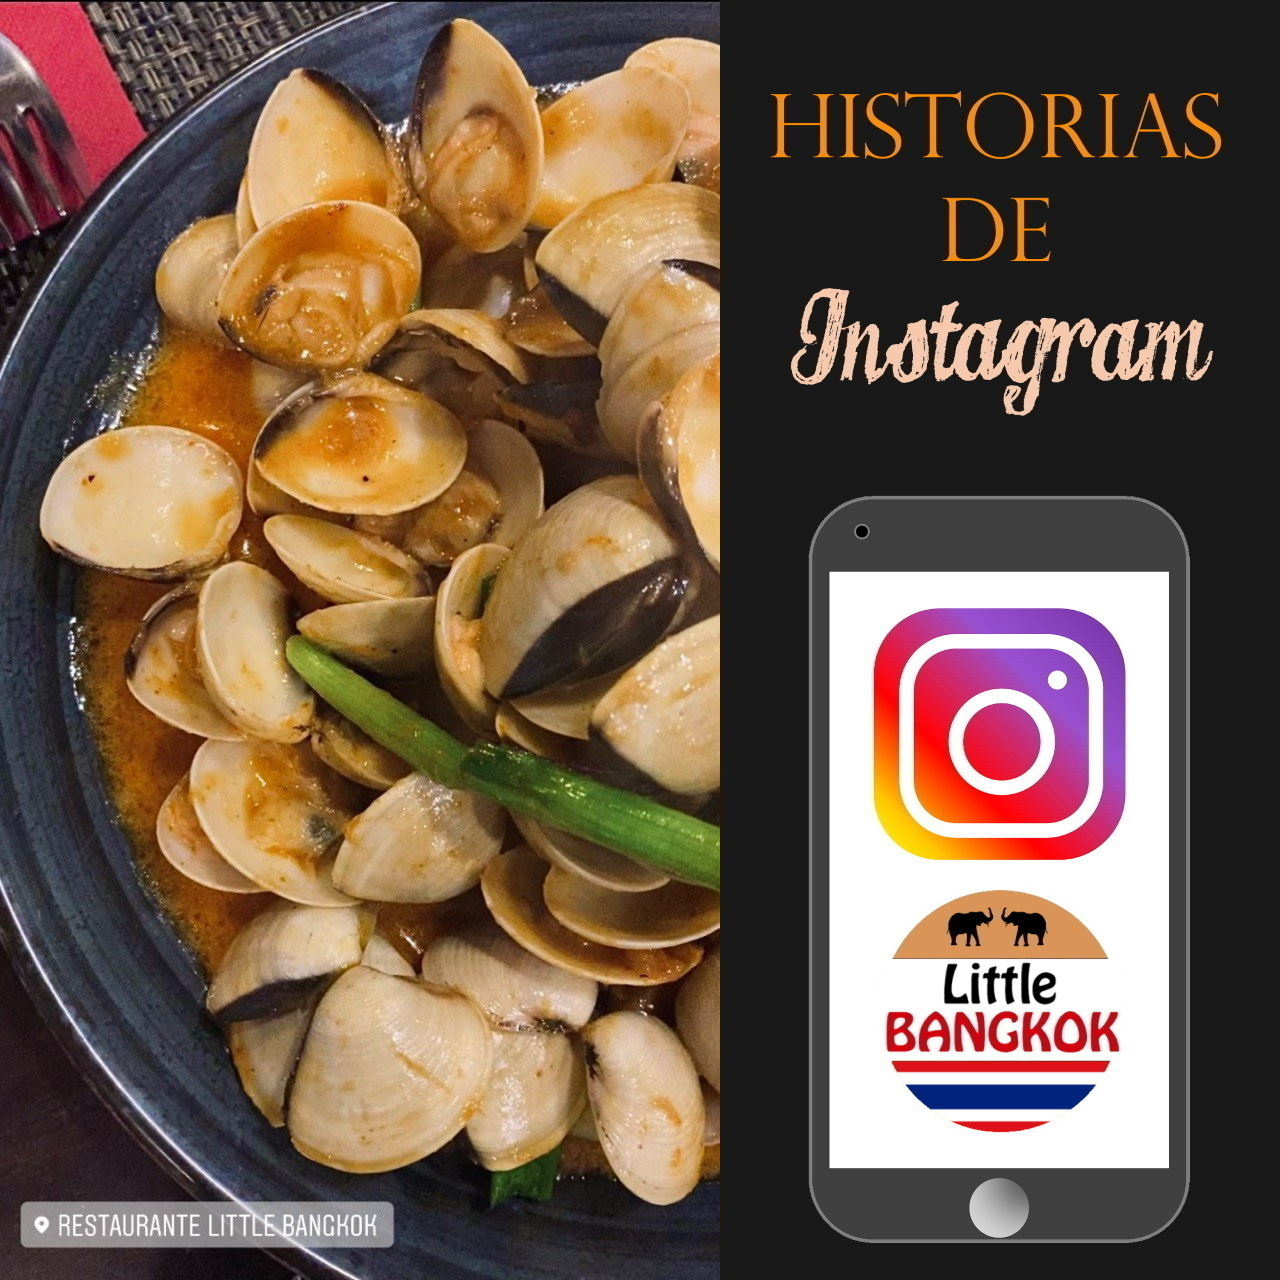 Historias de Instagram - 07 - Julio 1